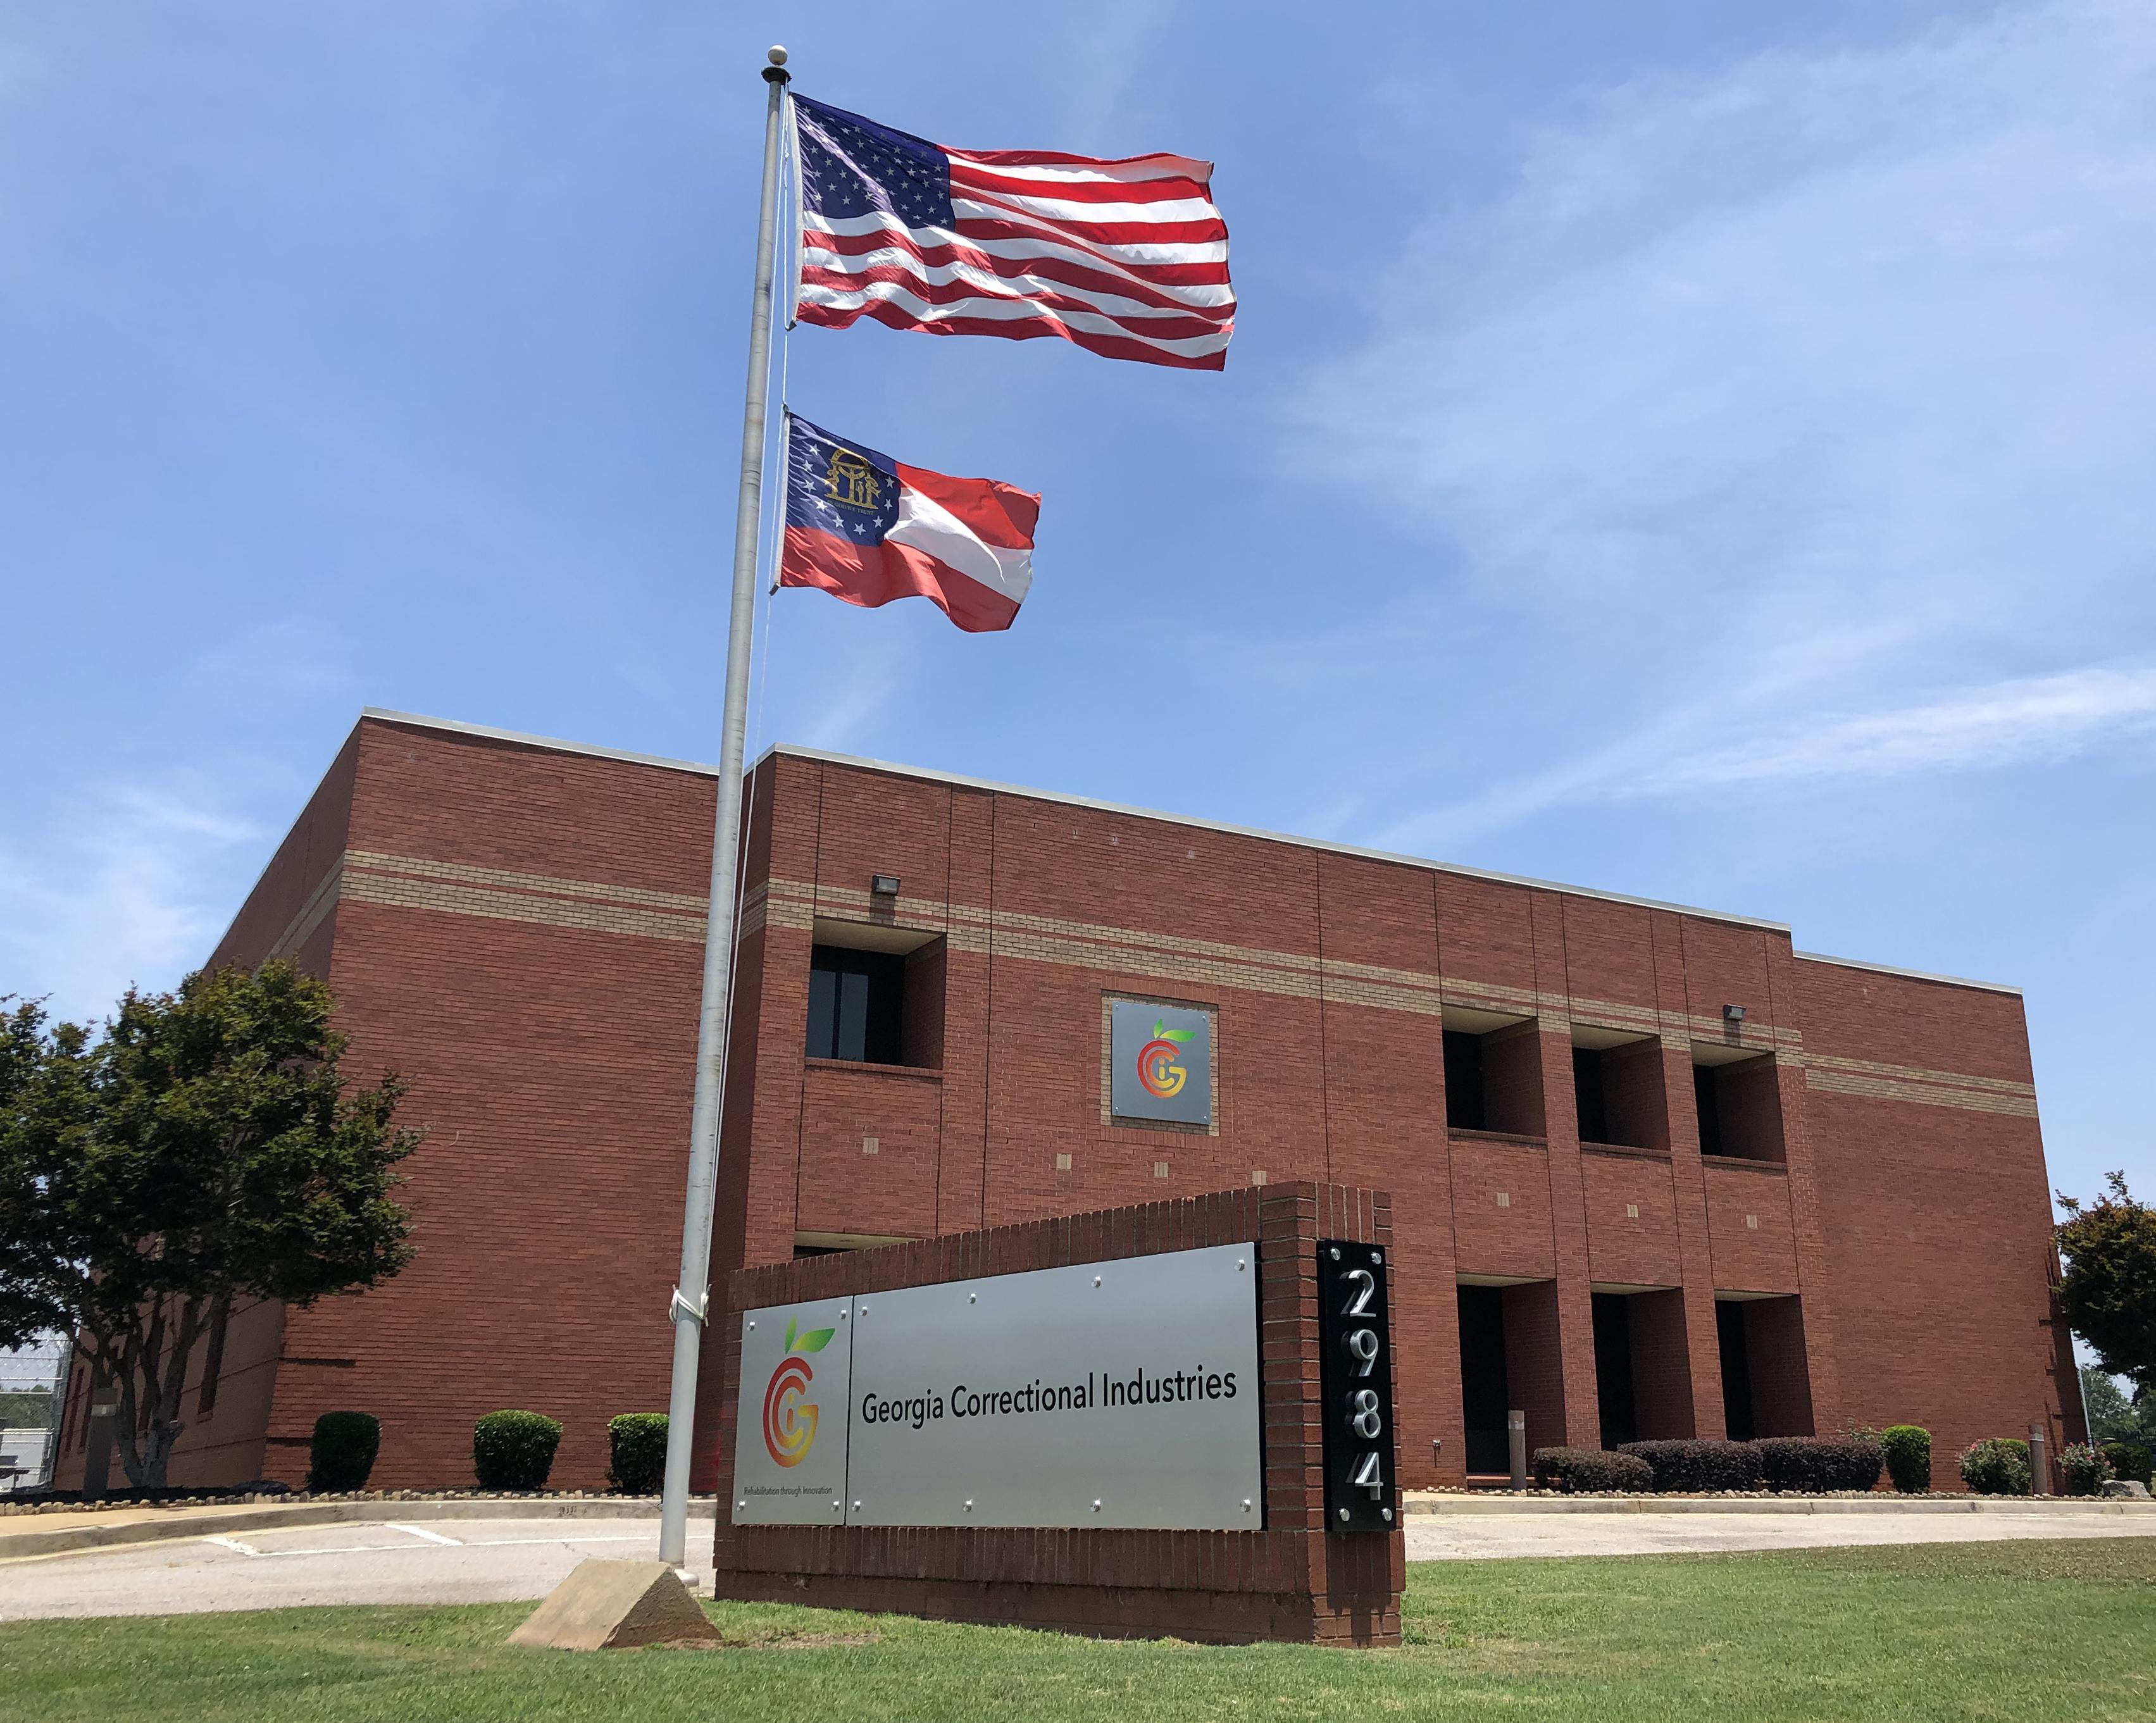 Georgia Correctional Industries Headquarters